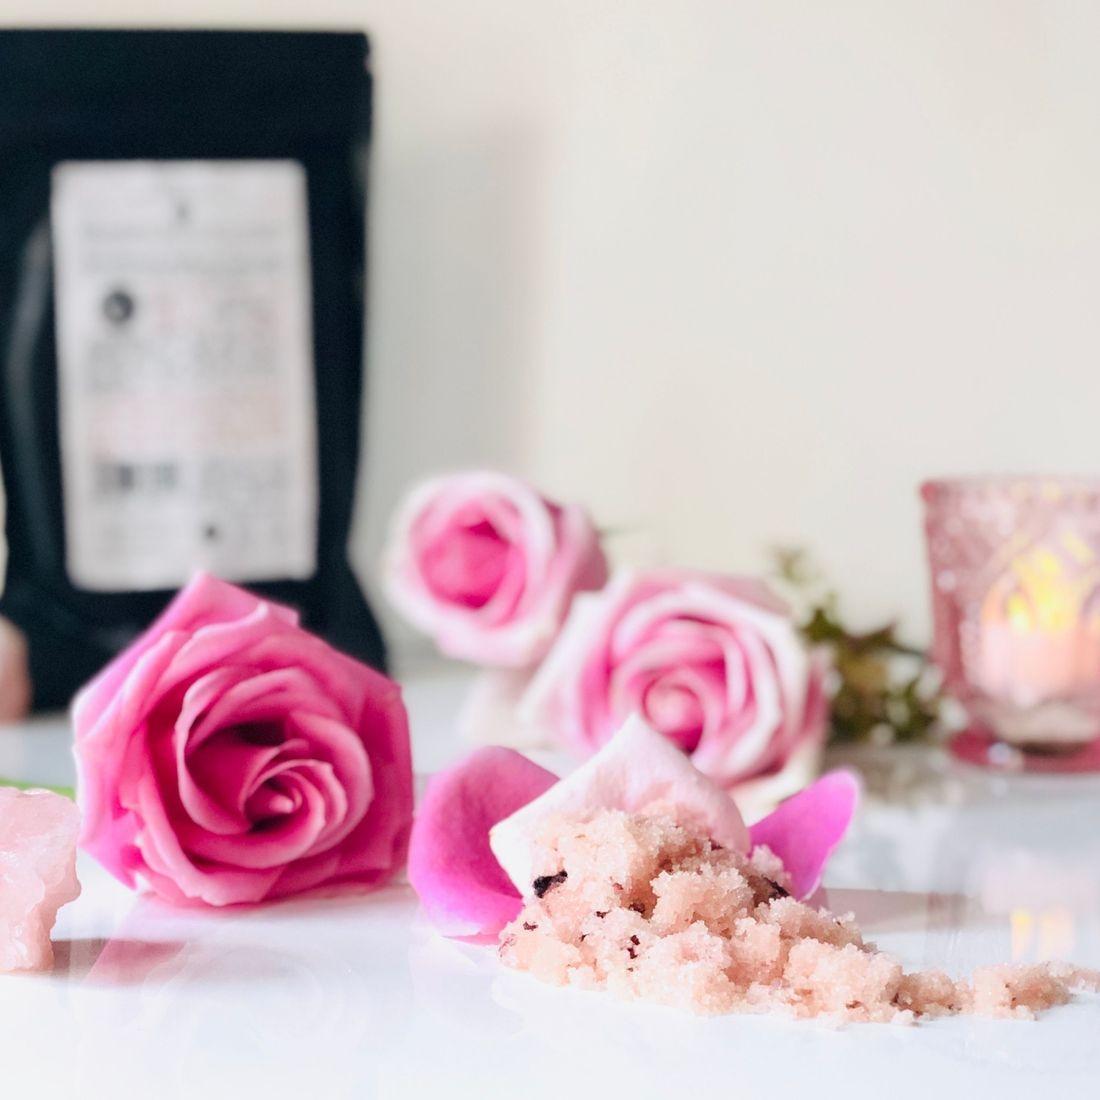 Hand Cuticle Oil, Clean Beauty Box, Aromatherapy Box, Bulgarian Rose Oil, Rose Oil, RosePost Fall Box, RosePost Box, Green Beauty Subscription, Rose Beauty Box, Green Beauty Box, Valentines Day Gift, Best Rose Skincare